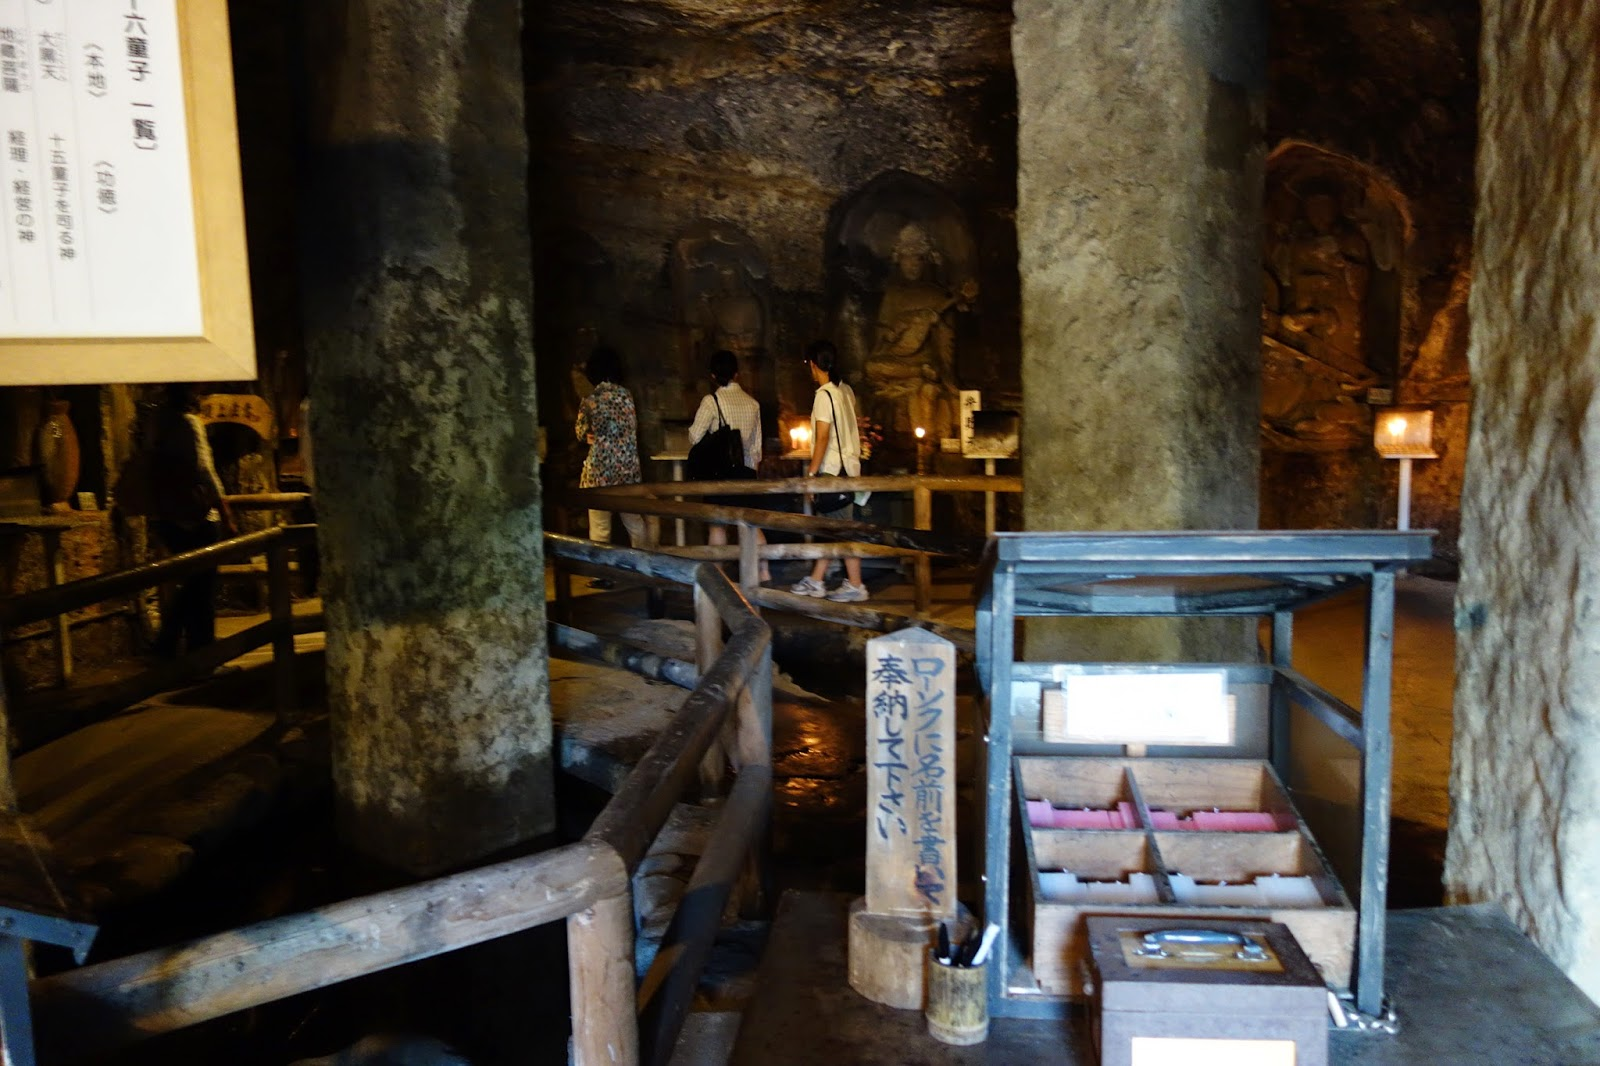 Hasedera 長谷寺 temple Hase Temple kamakura japan tour trip cave